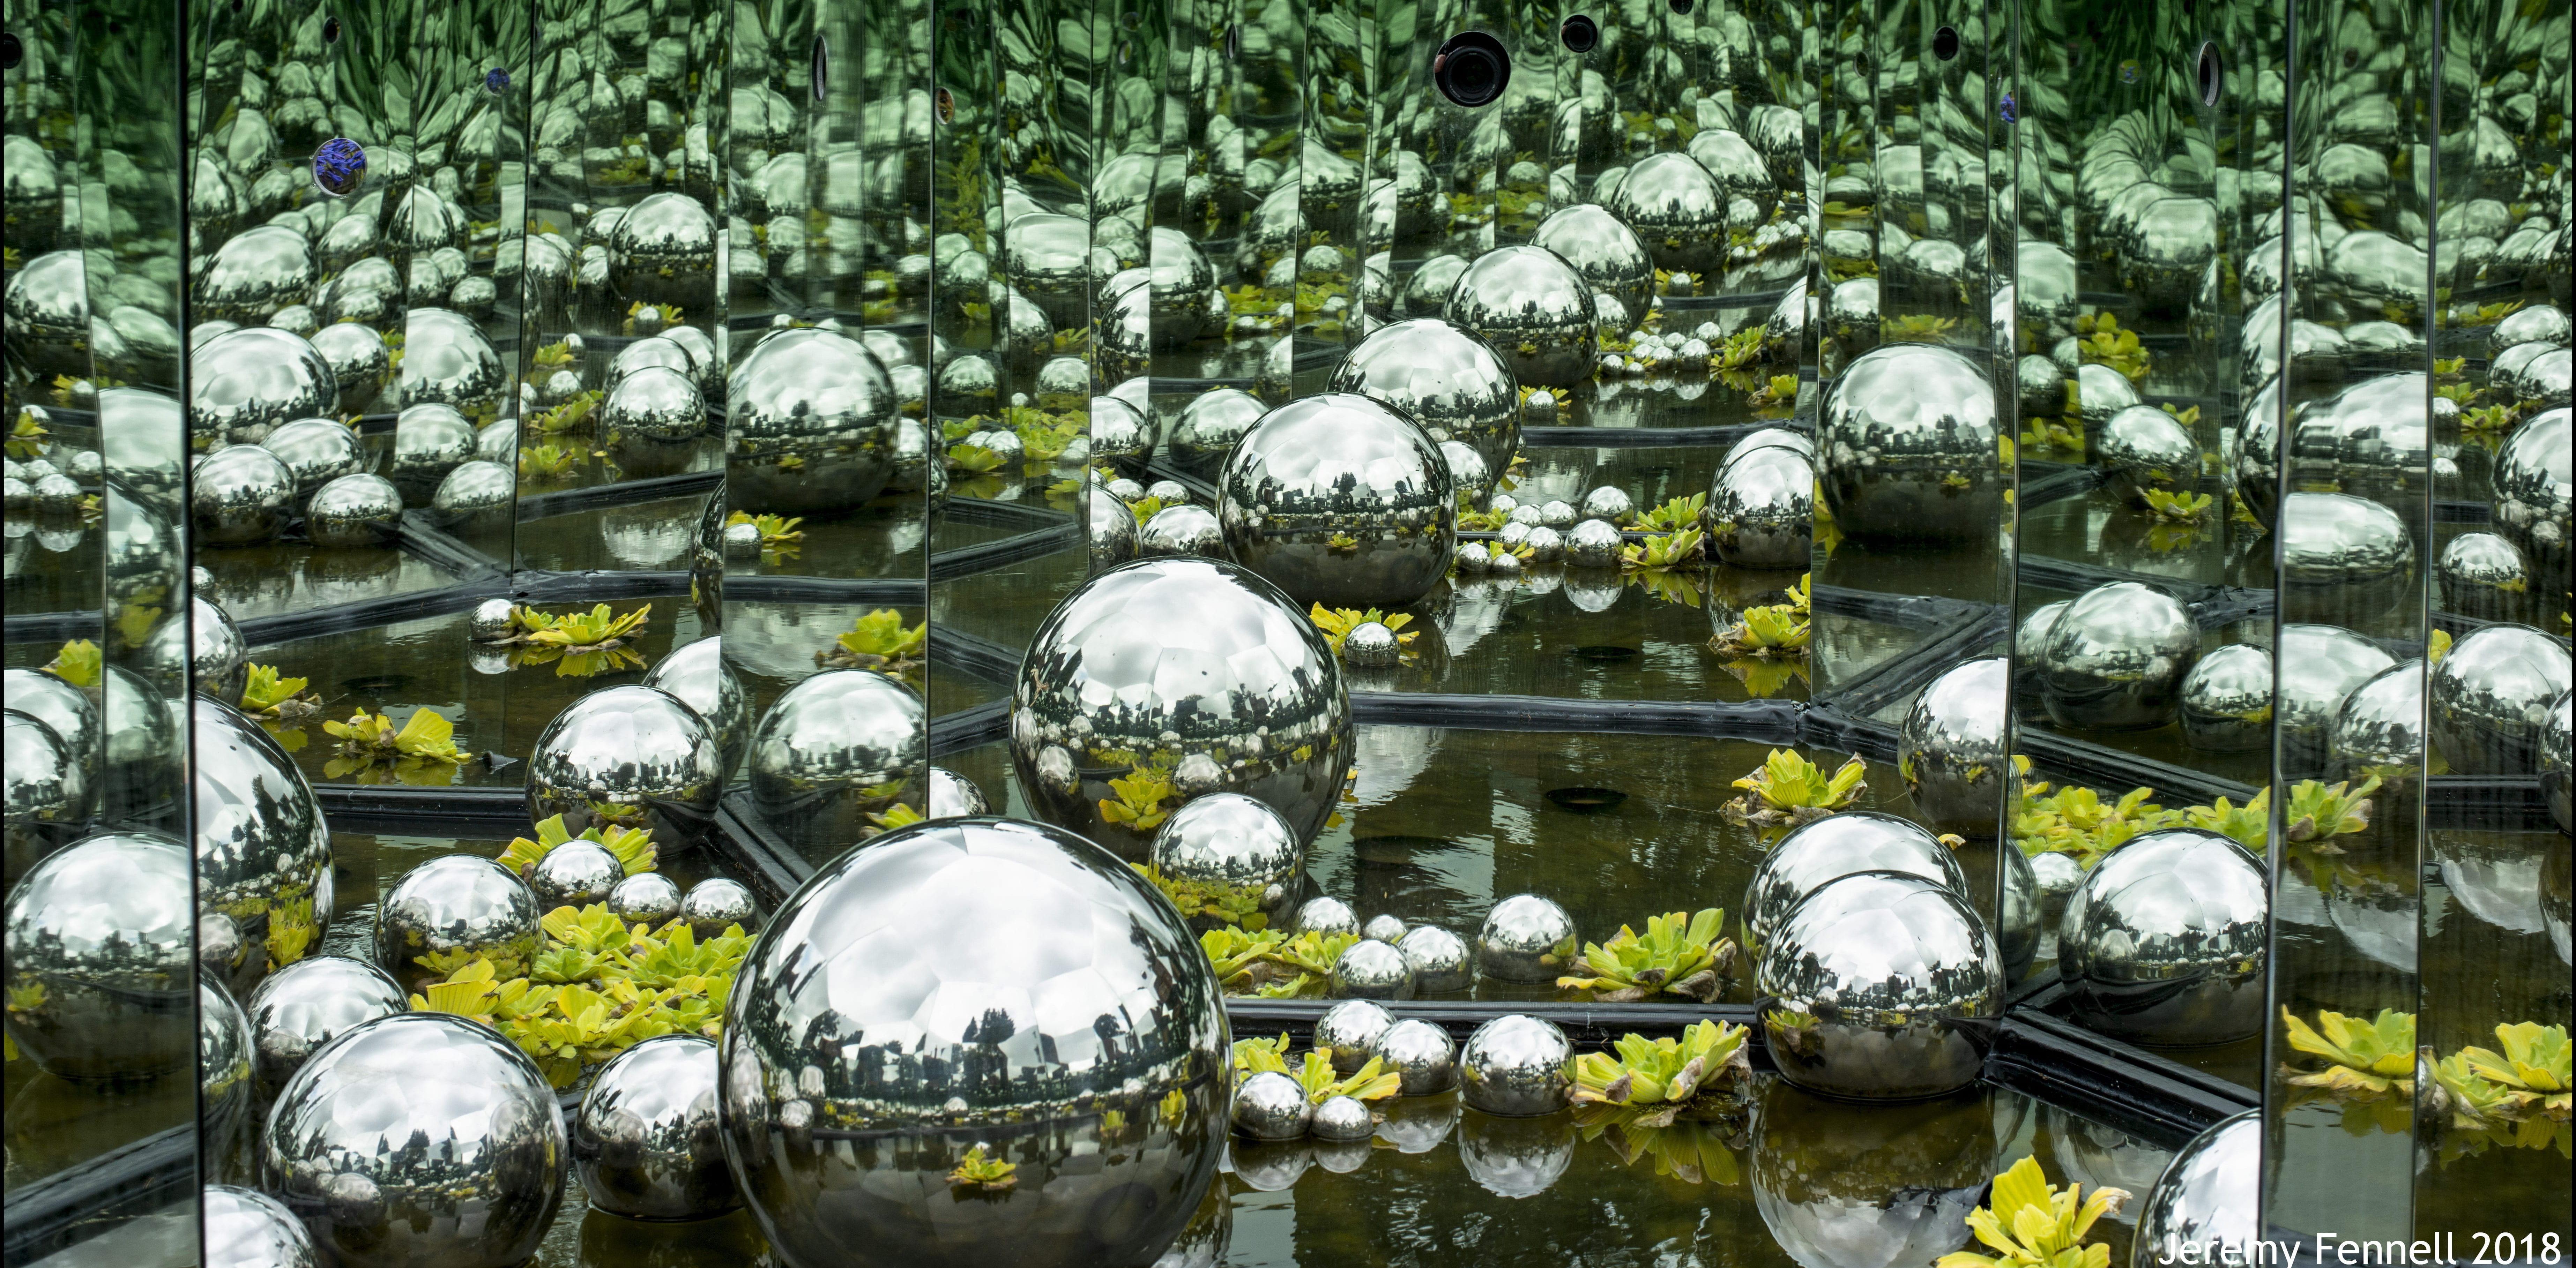 Impossible Garden by Luke Jerram with Bristol Vision Institute